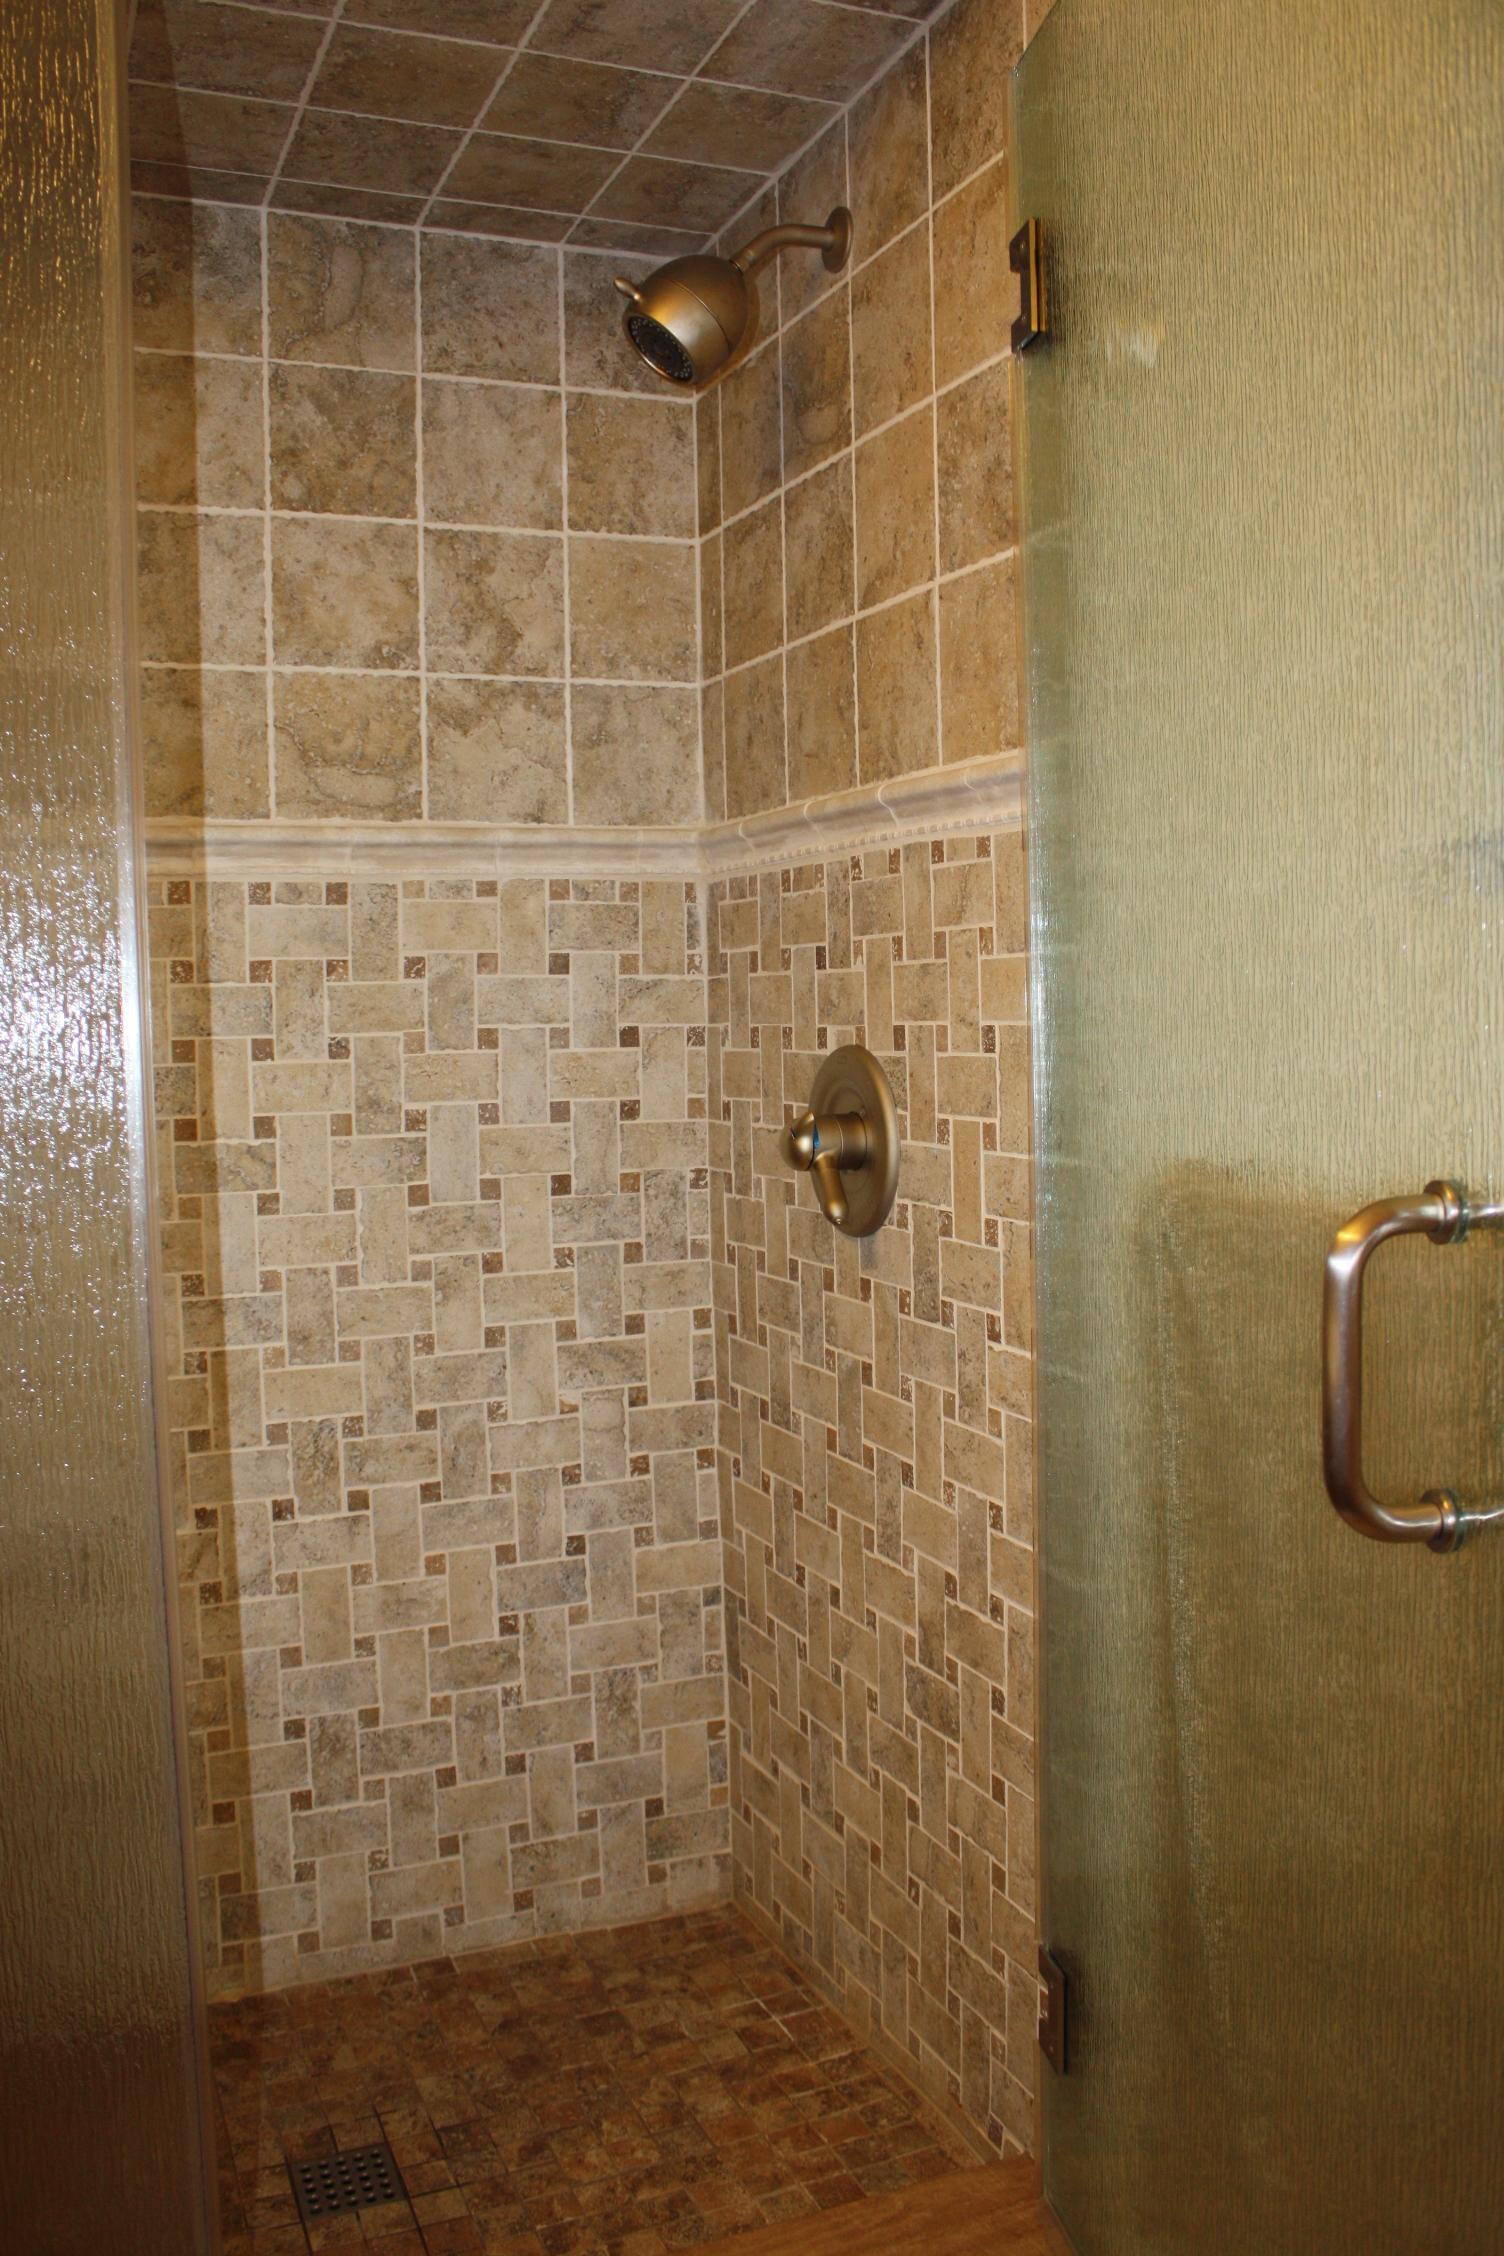 cvisions_bathroom_remodel1.JPG